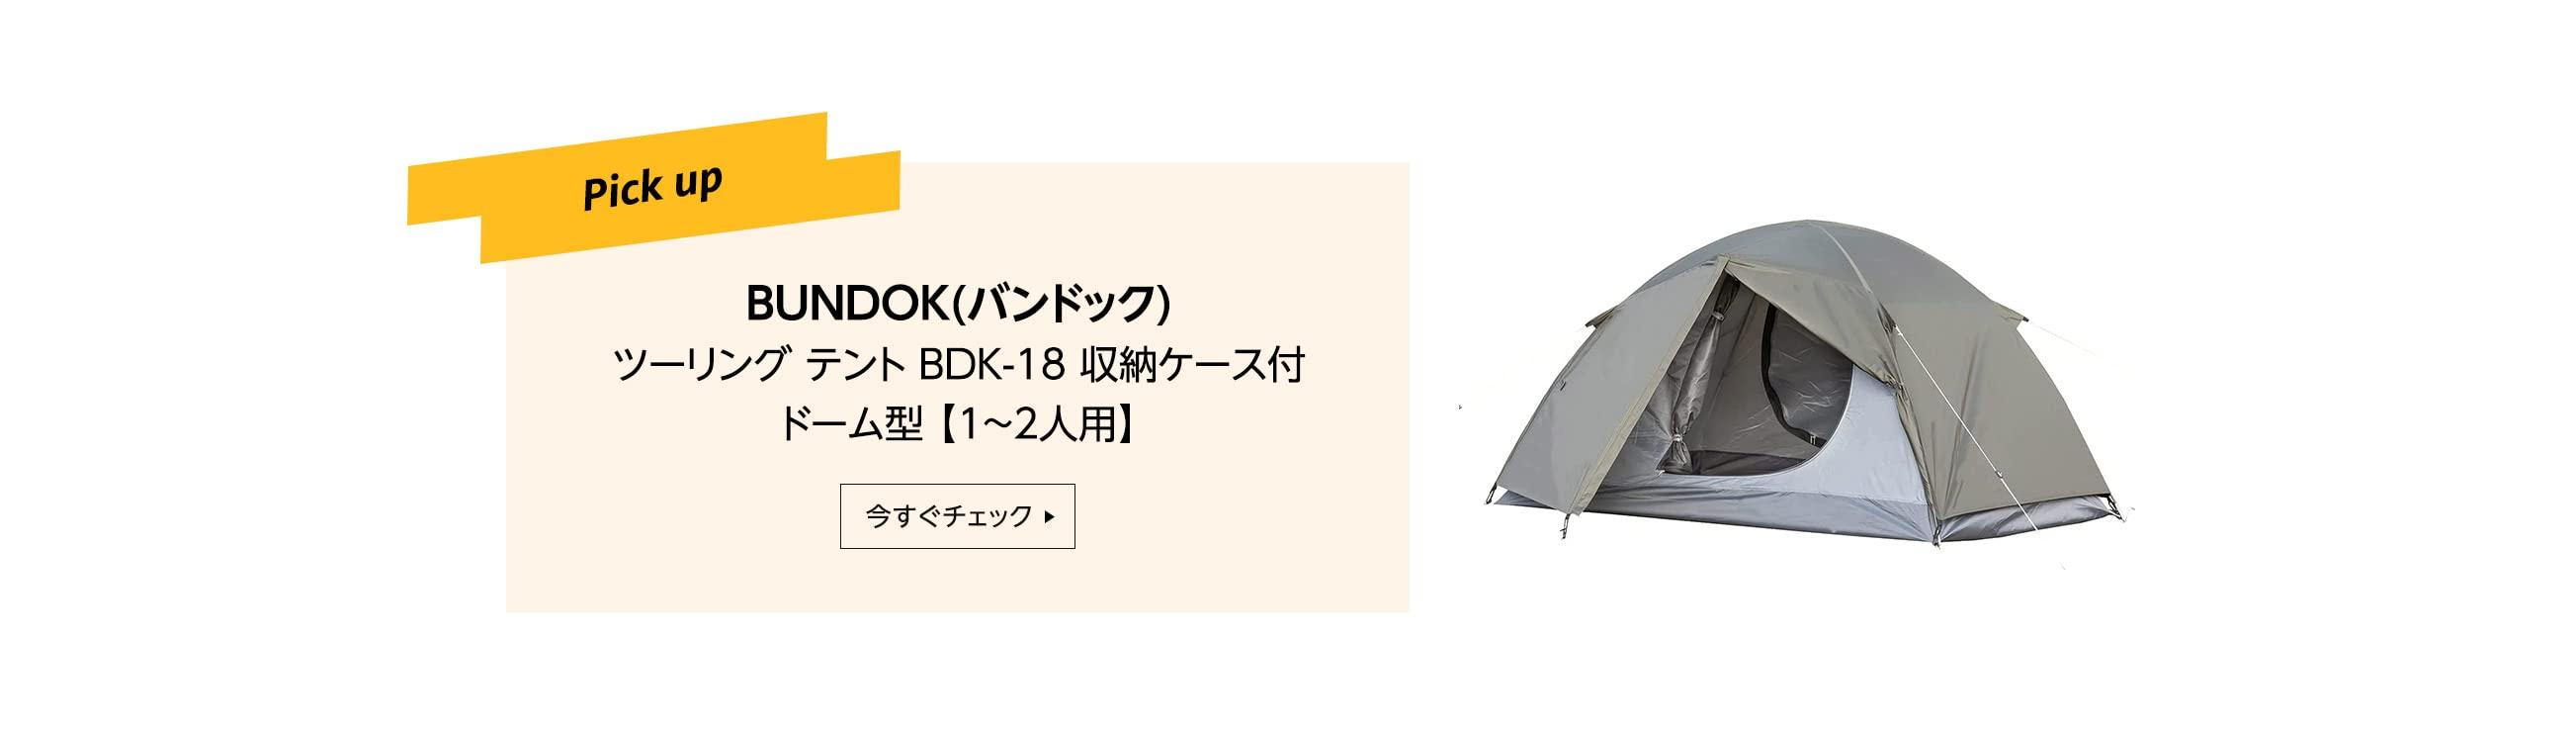 Pick up BUNDOK(バンドック) ツーリング テント BDK-18 収納ケース付 ドーム型【1~2人用】